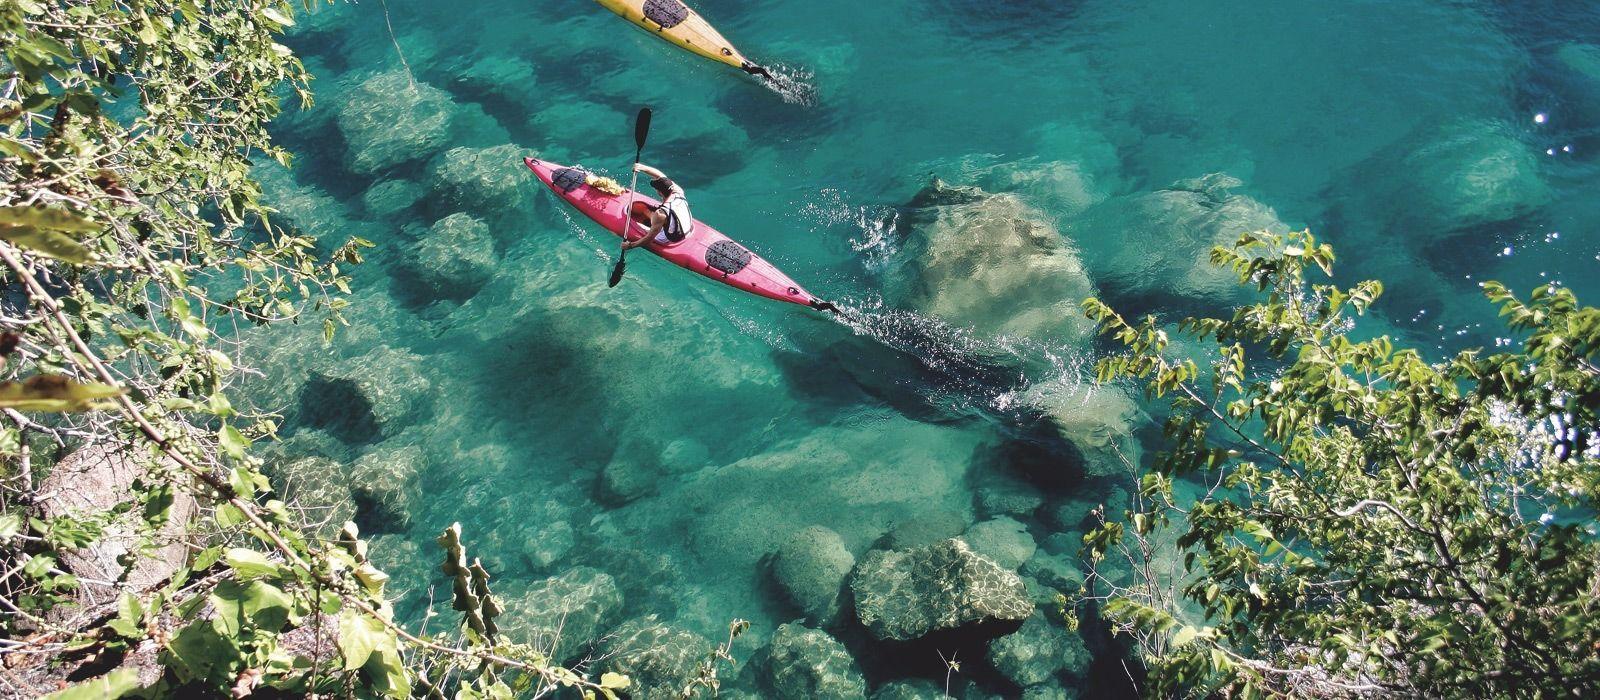 South Luangwa, Lake Malawi and Indian Ocean Dreams Tour Trip 3